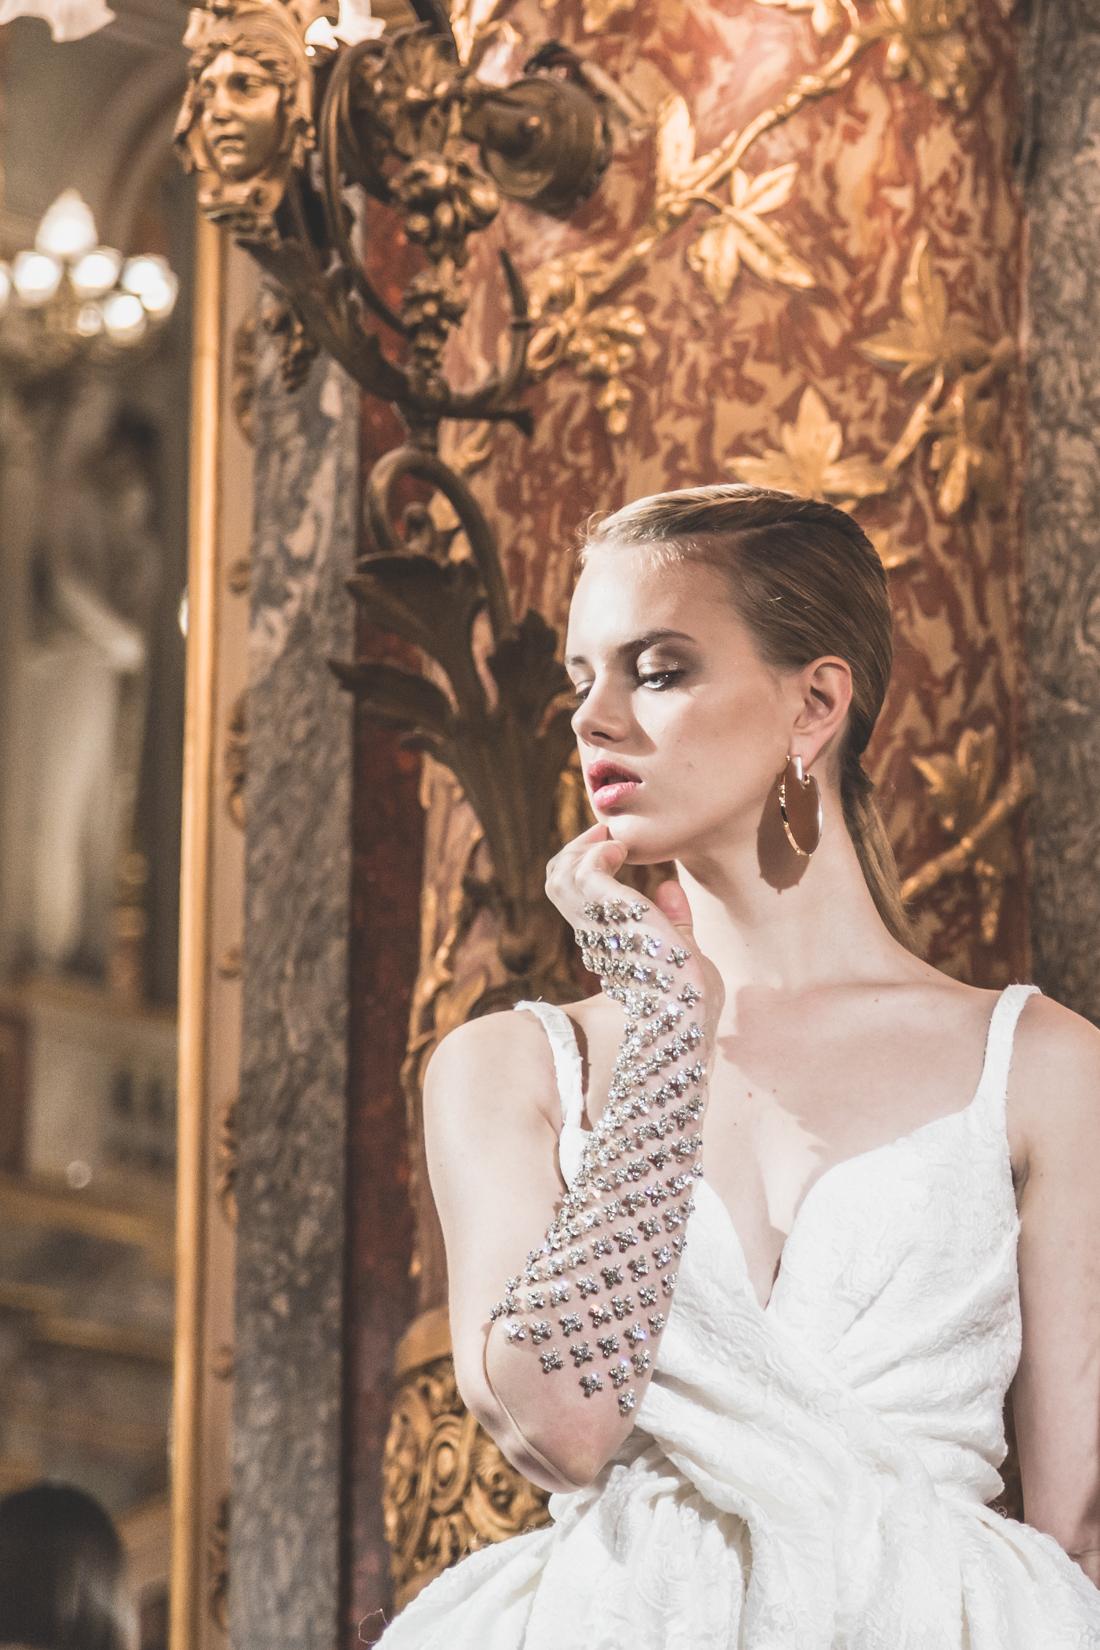 show_paule_ka_mirror_photographe_pauline_privez_copyright_paulinefashionblog_com-19